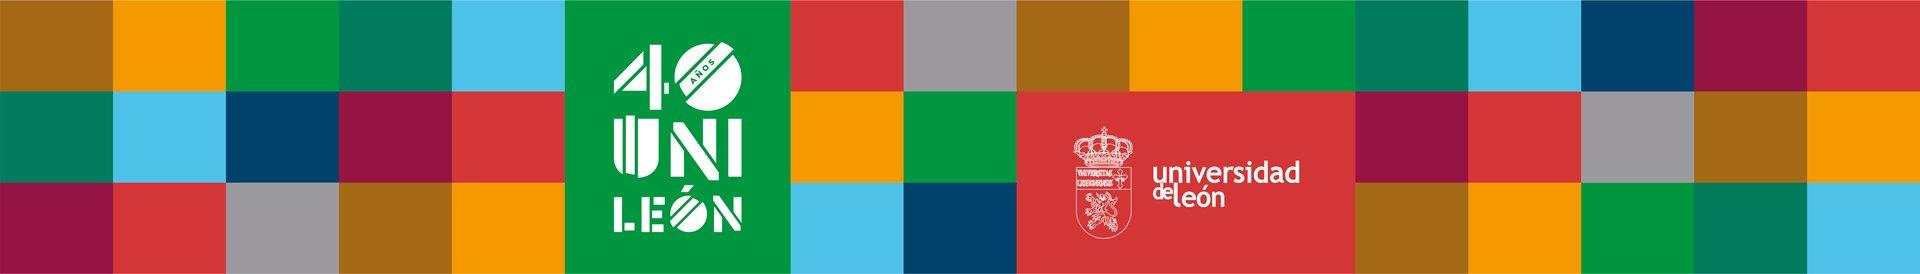 40th Anniversary University of Leon 2